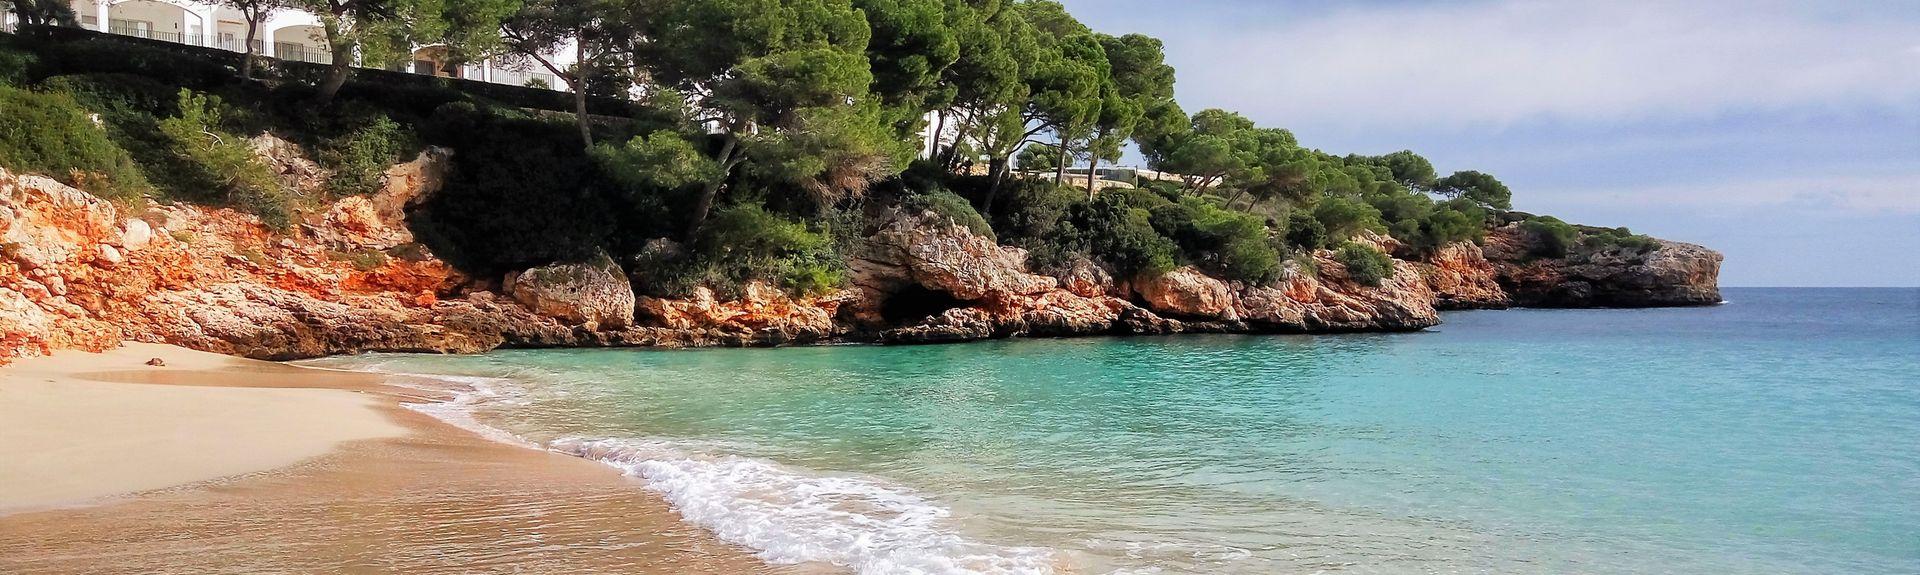 Cala s'Almunia, Santanyí, Islas Baleares, España